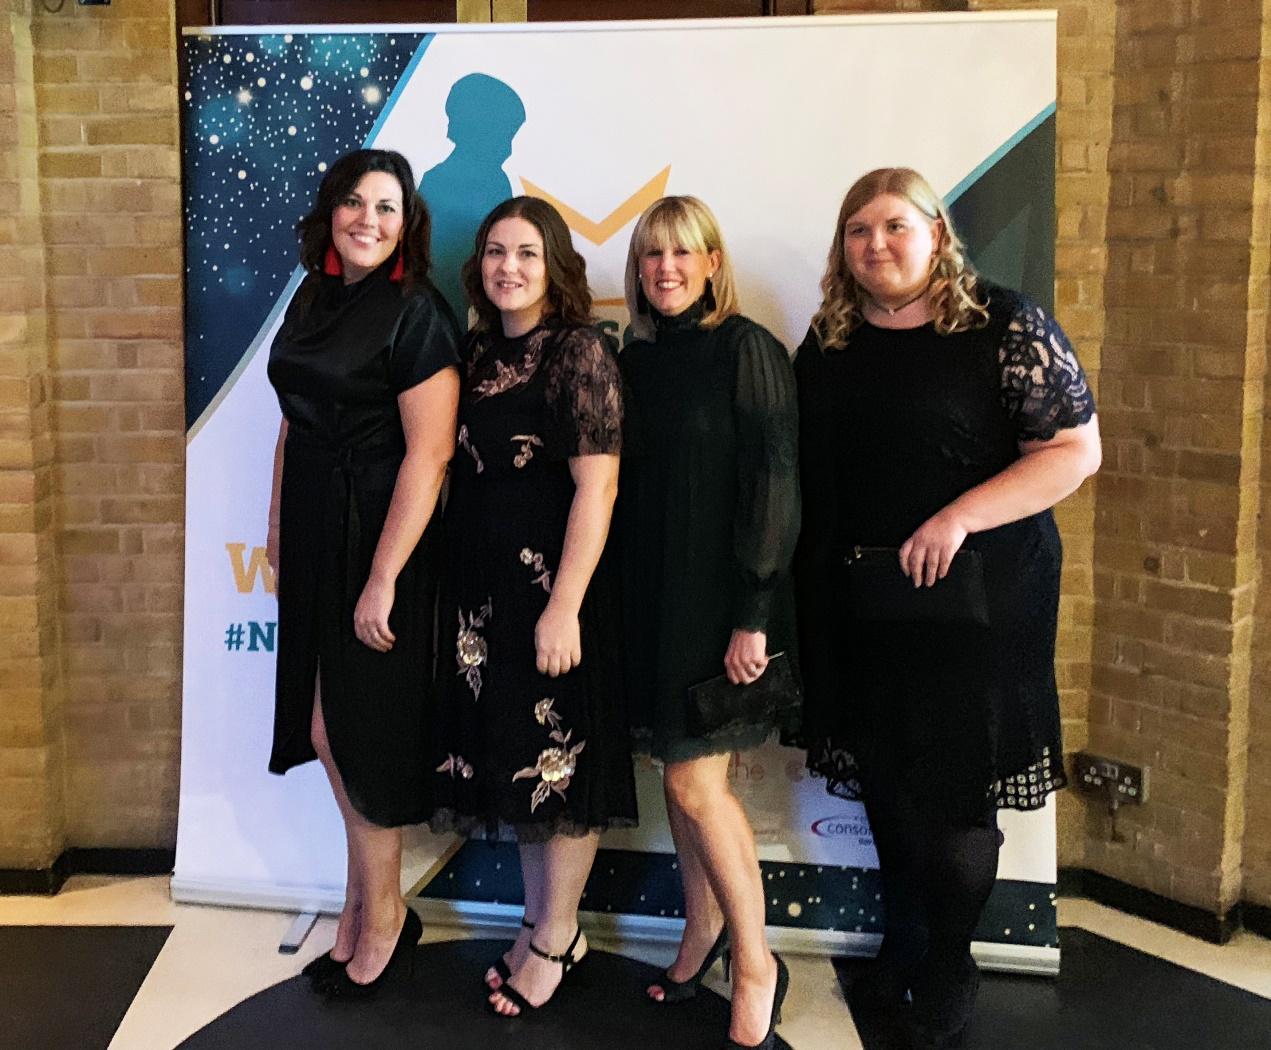 Elmscot (Woodlands) - Nursery World Awards 2018